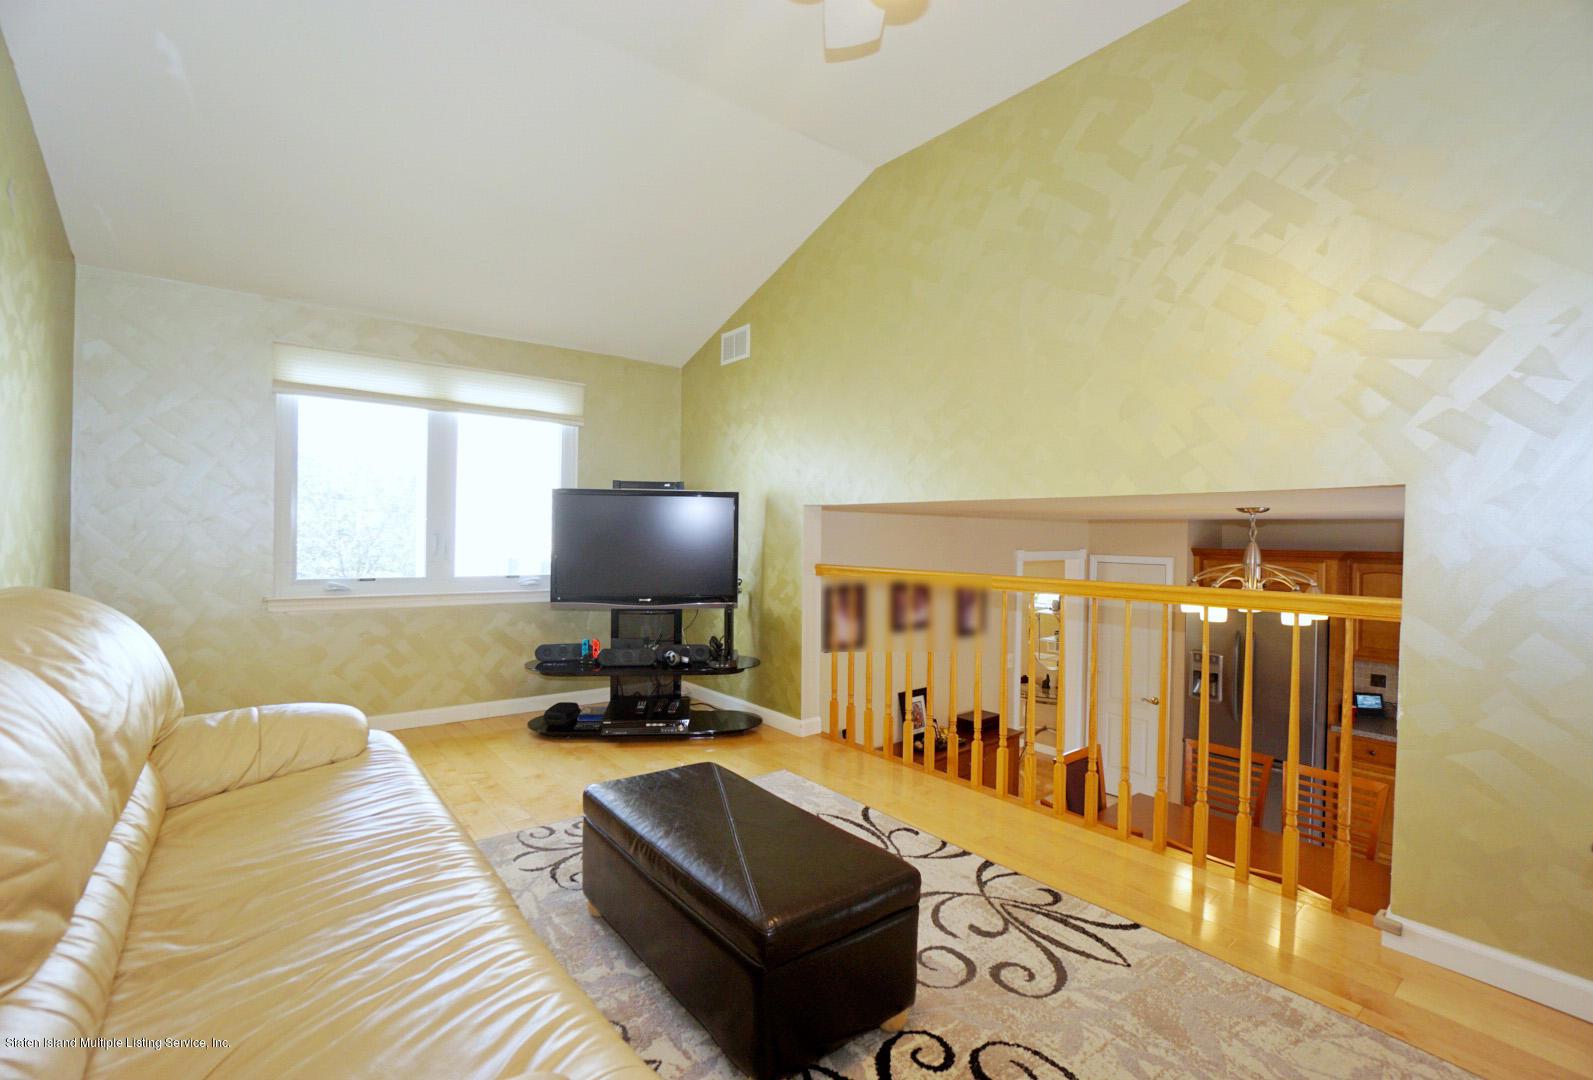 Single Family - Semi-Attached 18 Dunhill Lane  Staten Island, NY 10309, MLS-1139055-15